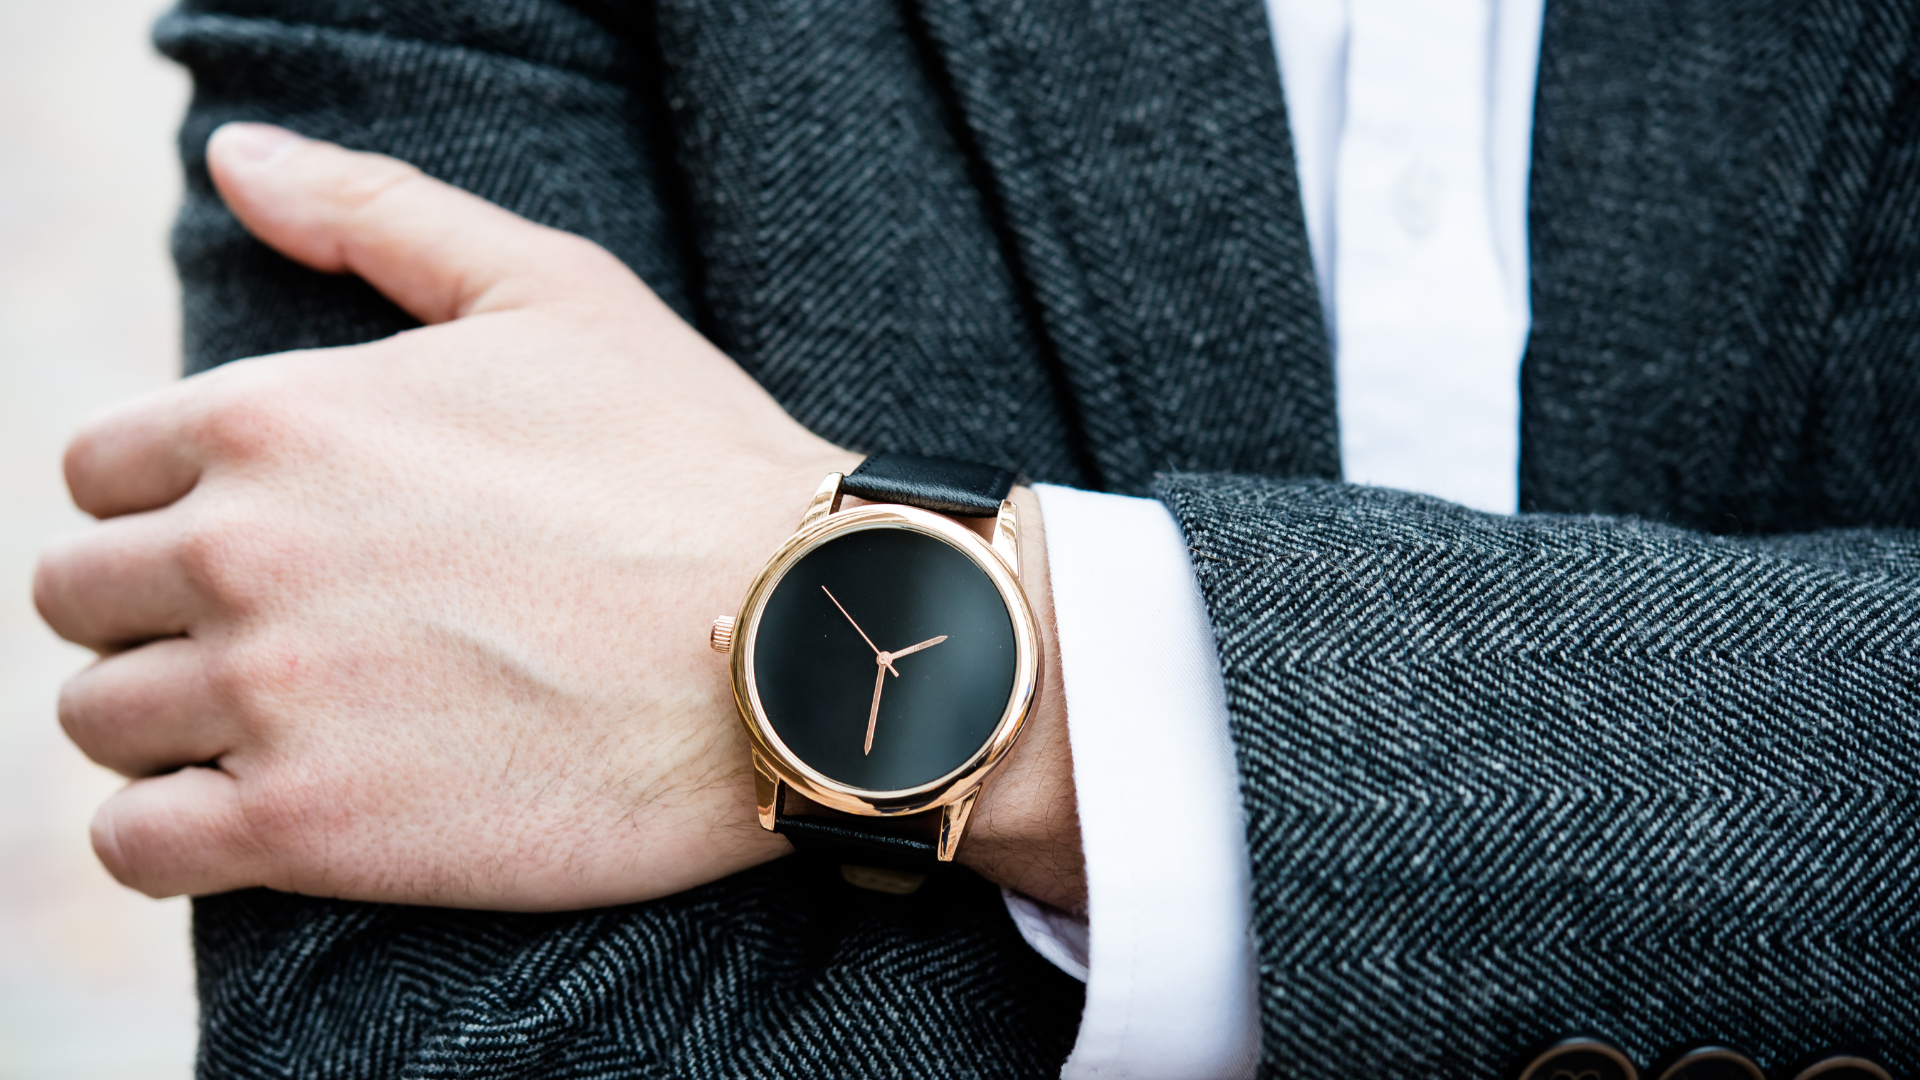 orologi da uomo costosi